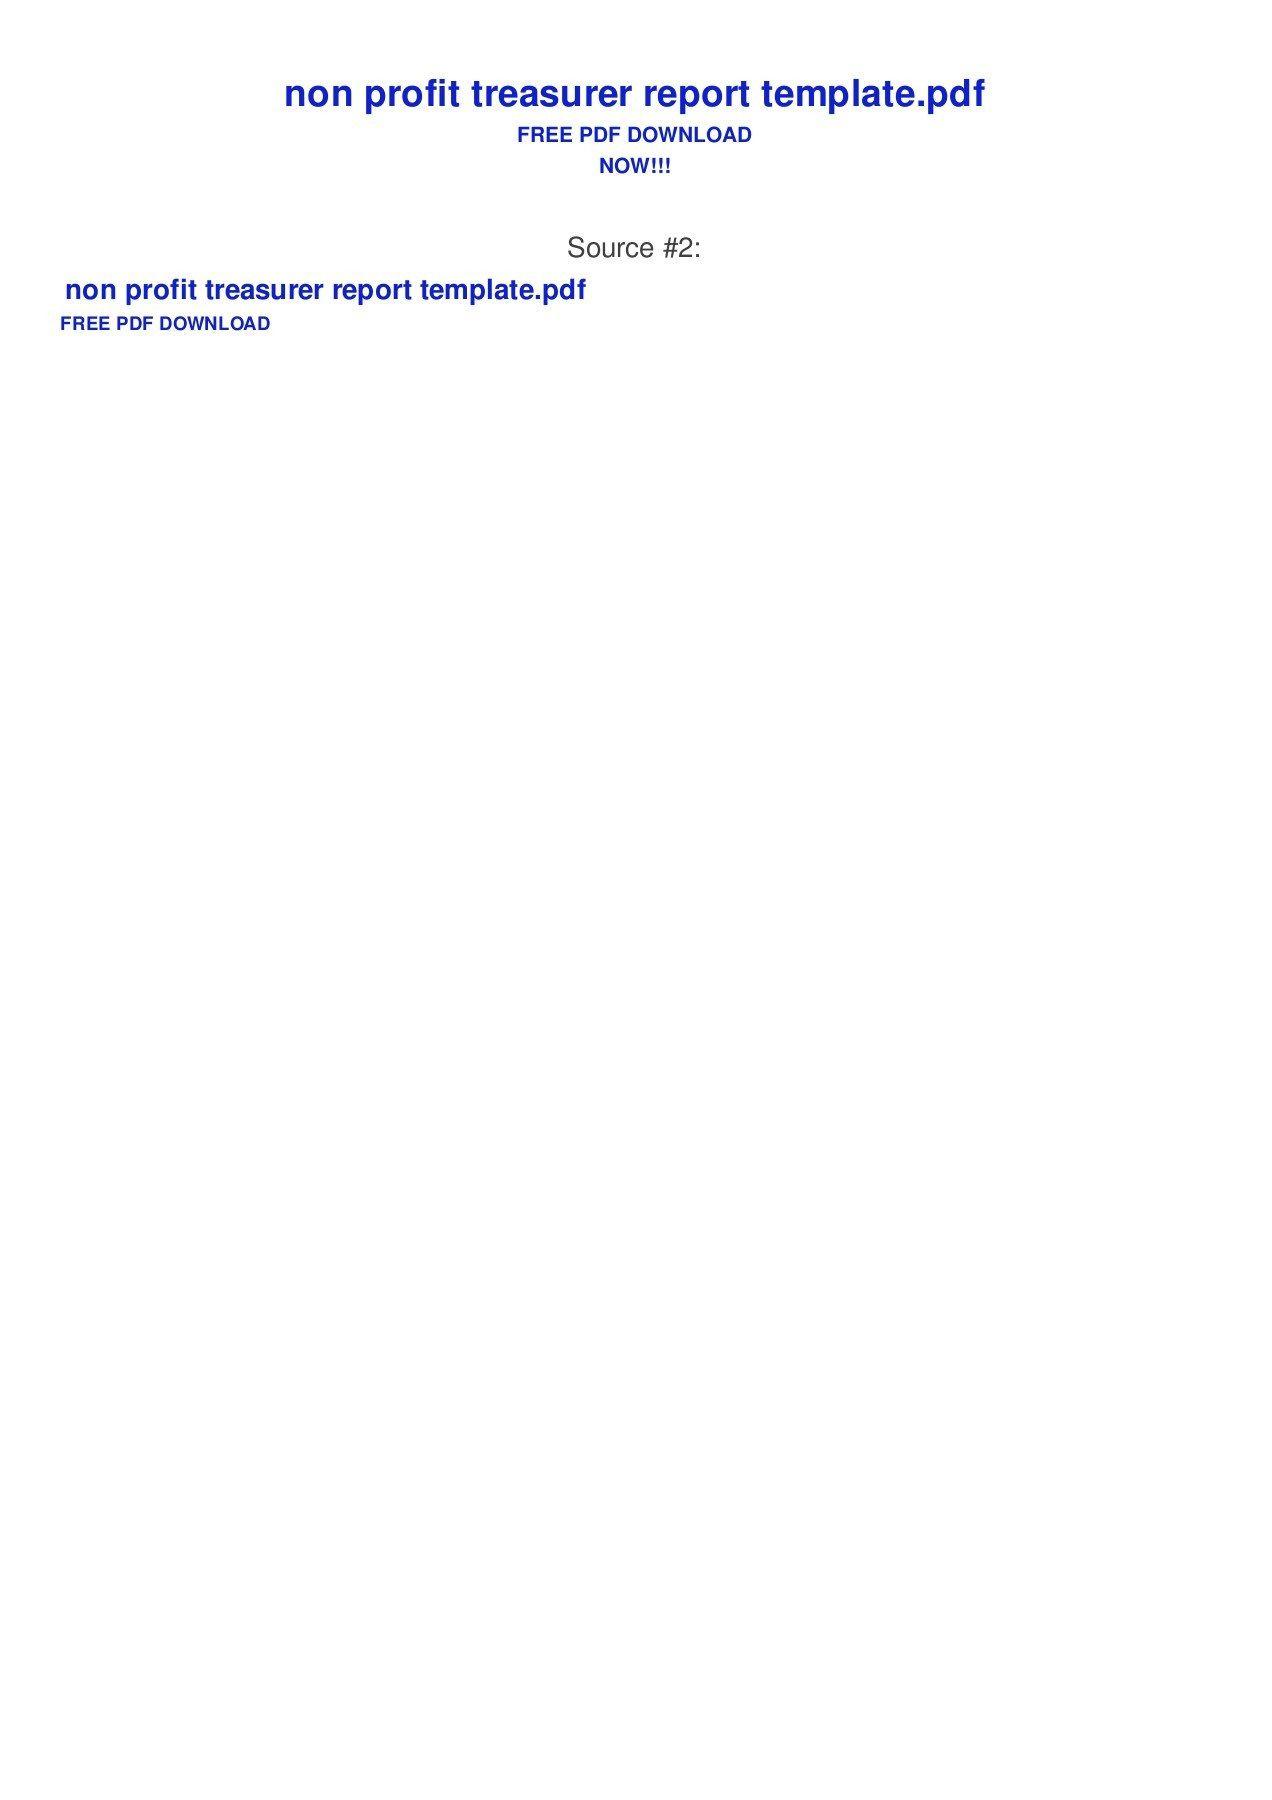 001 Stirring Treasurer Report Template Non Profit Picture  Treasurer' Word Free For Nonprofit OrganizationFull